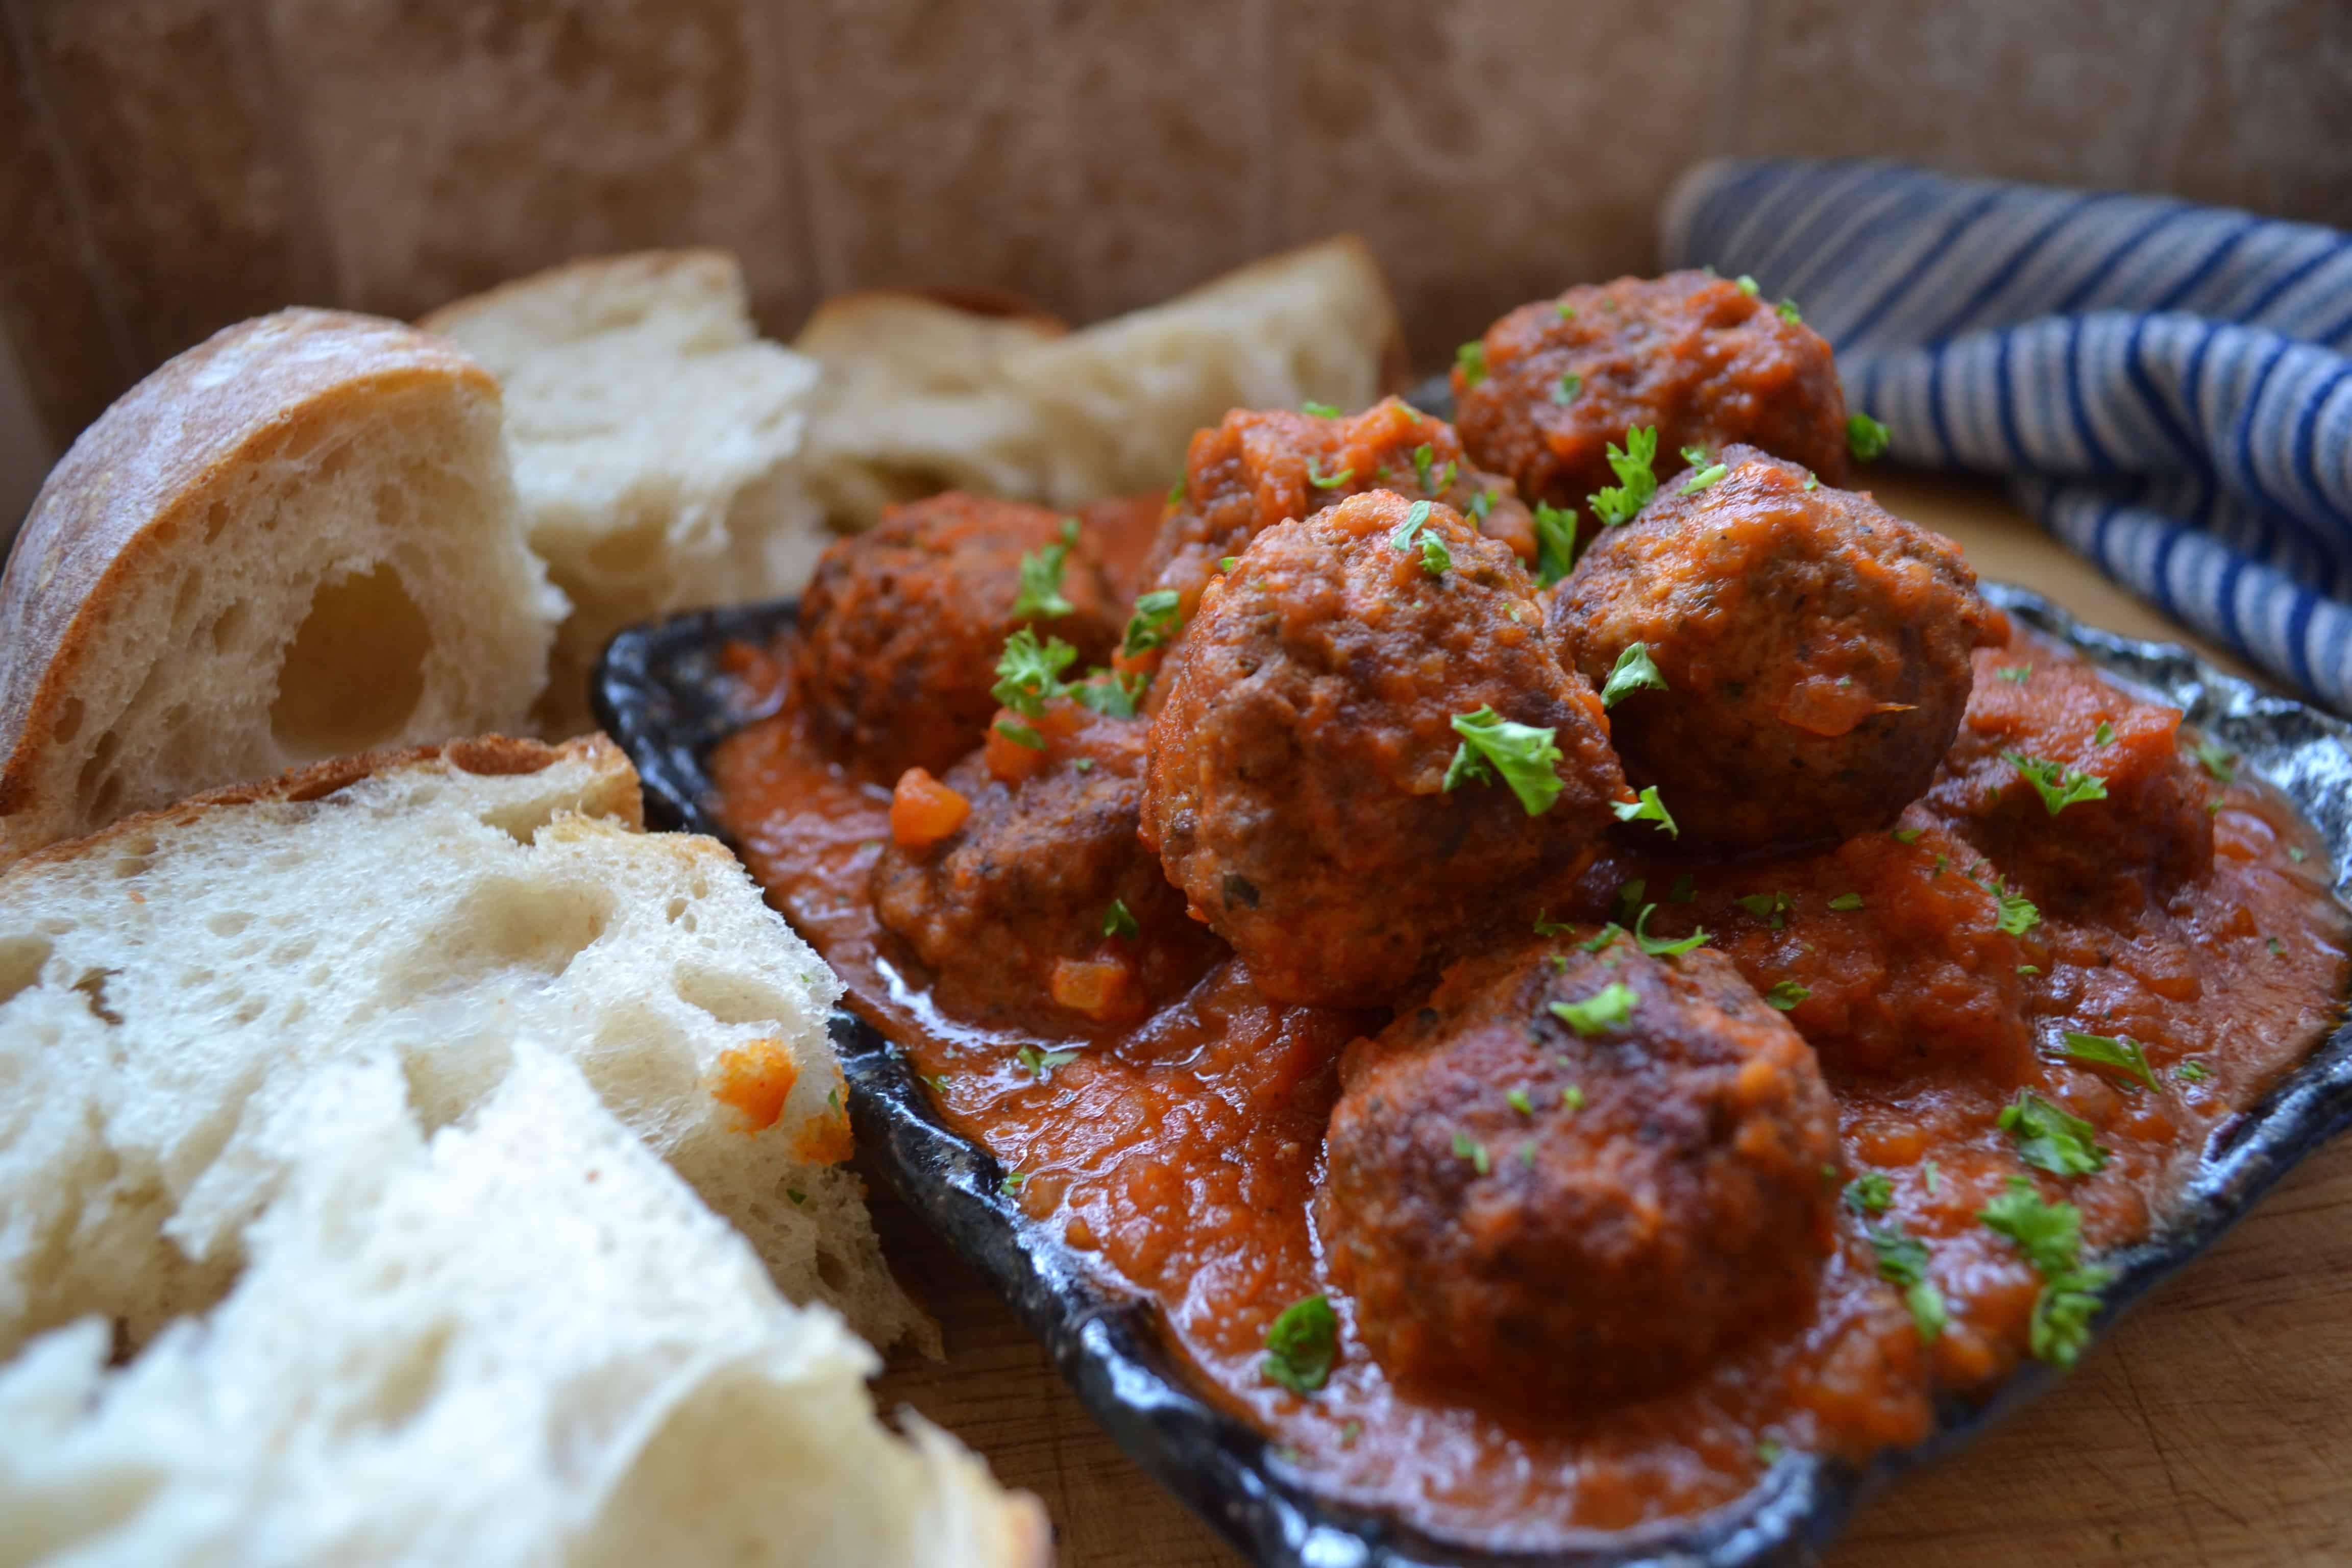 Tapas Spanish Meatballs (Albondigas)